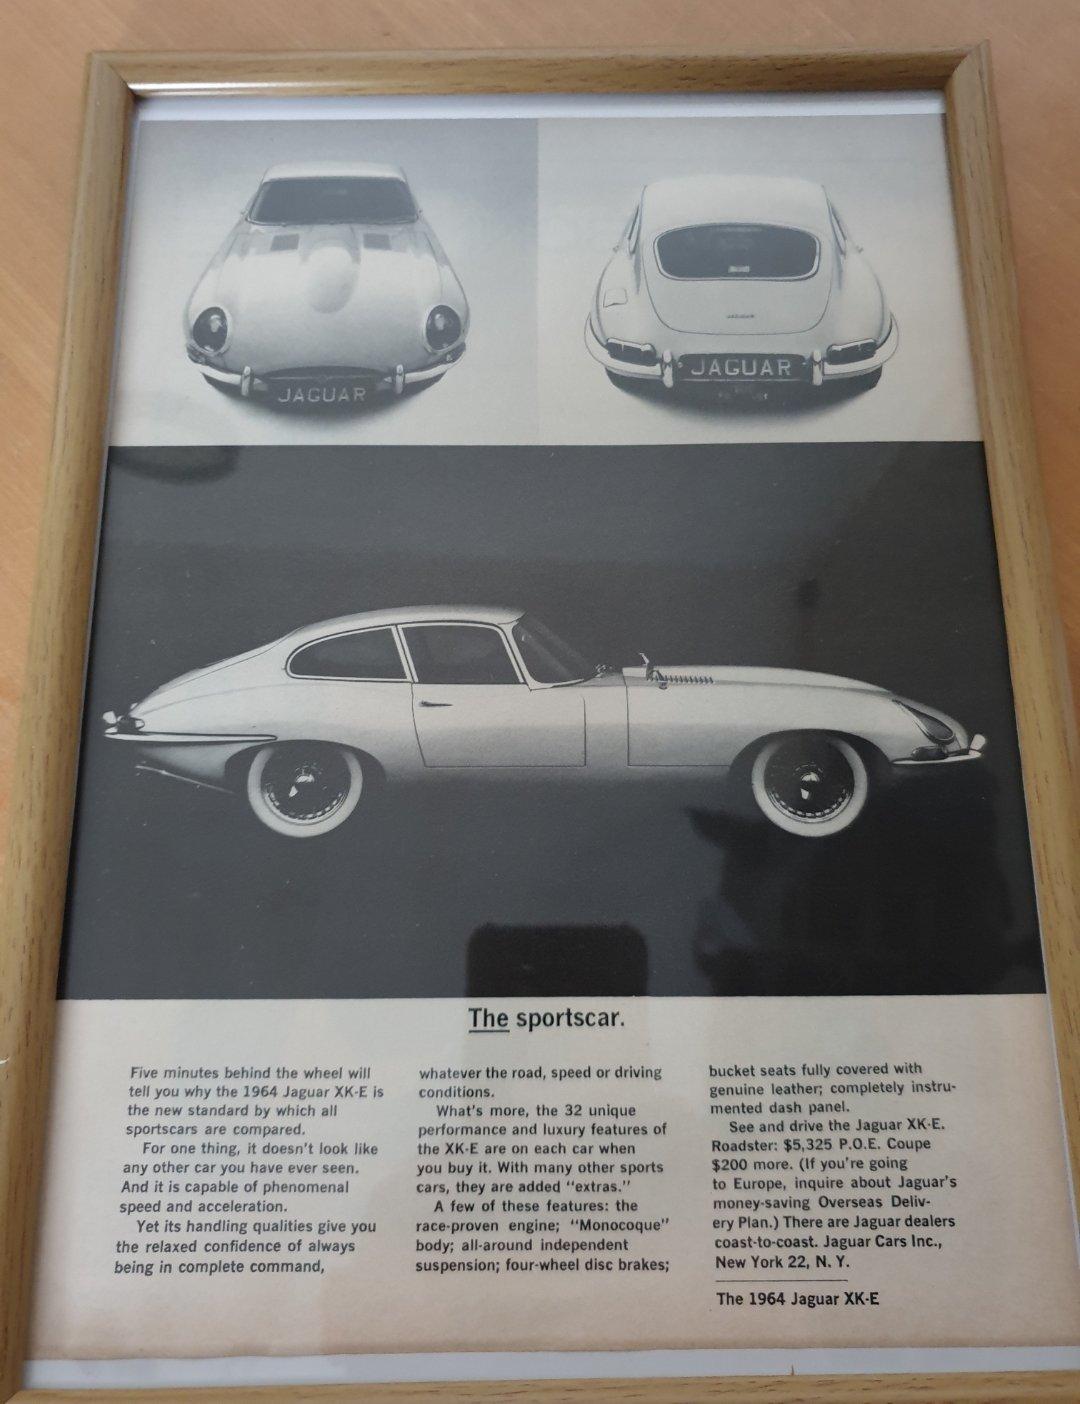 Original 1963 Jaguar E-Type Framed Advert